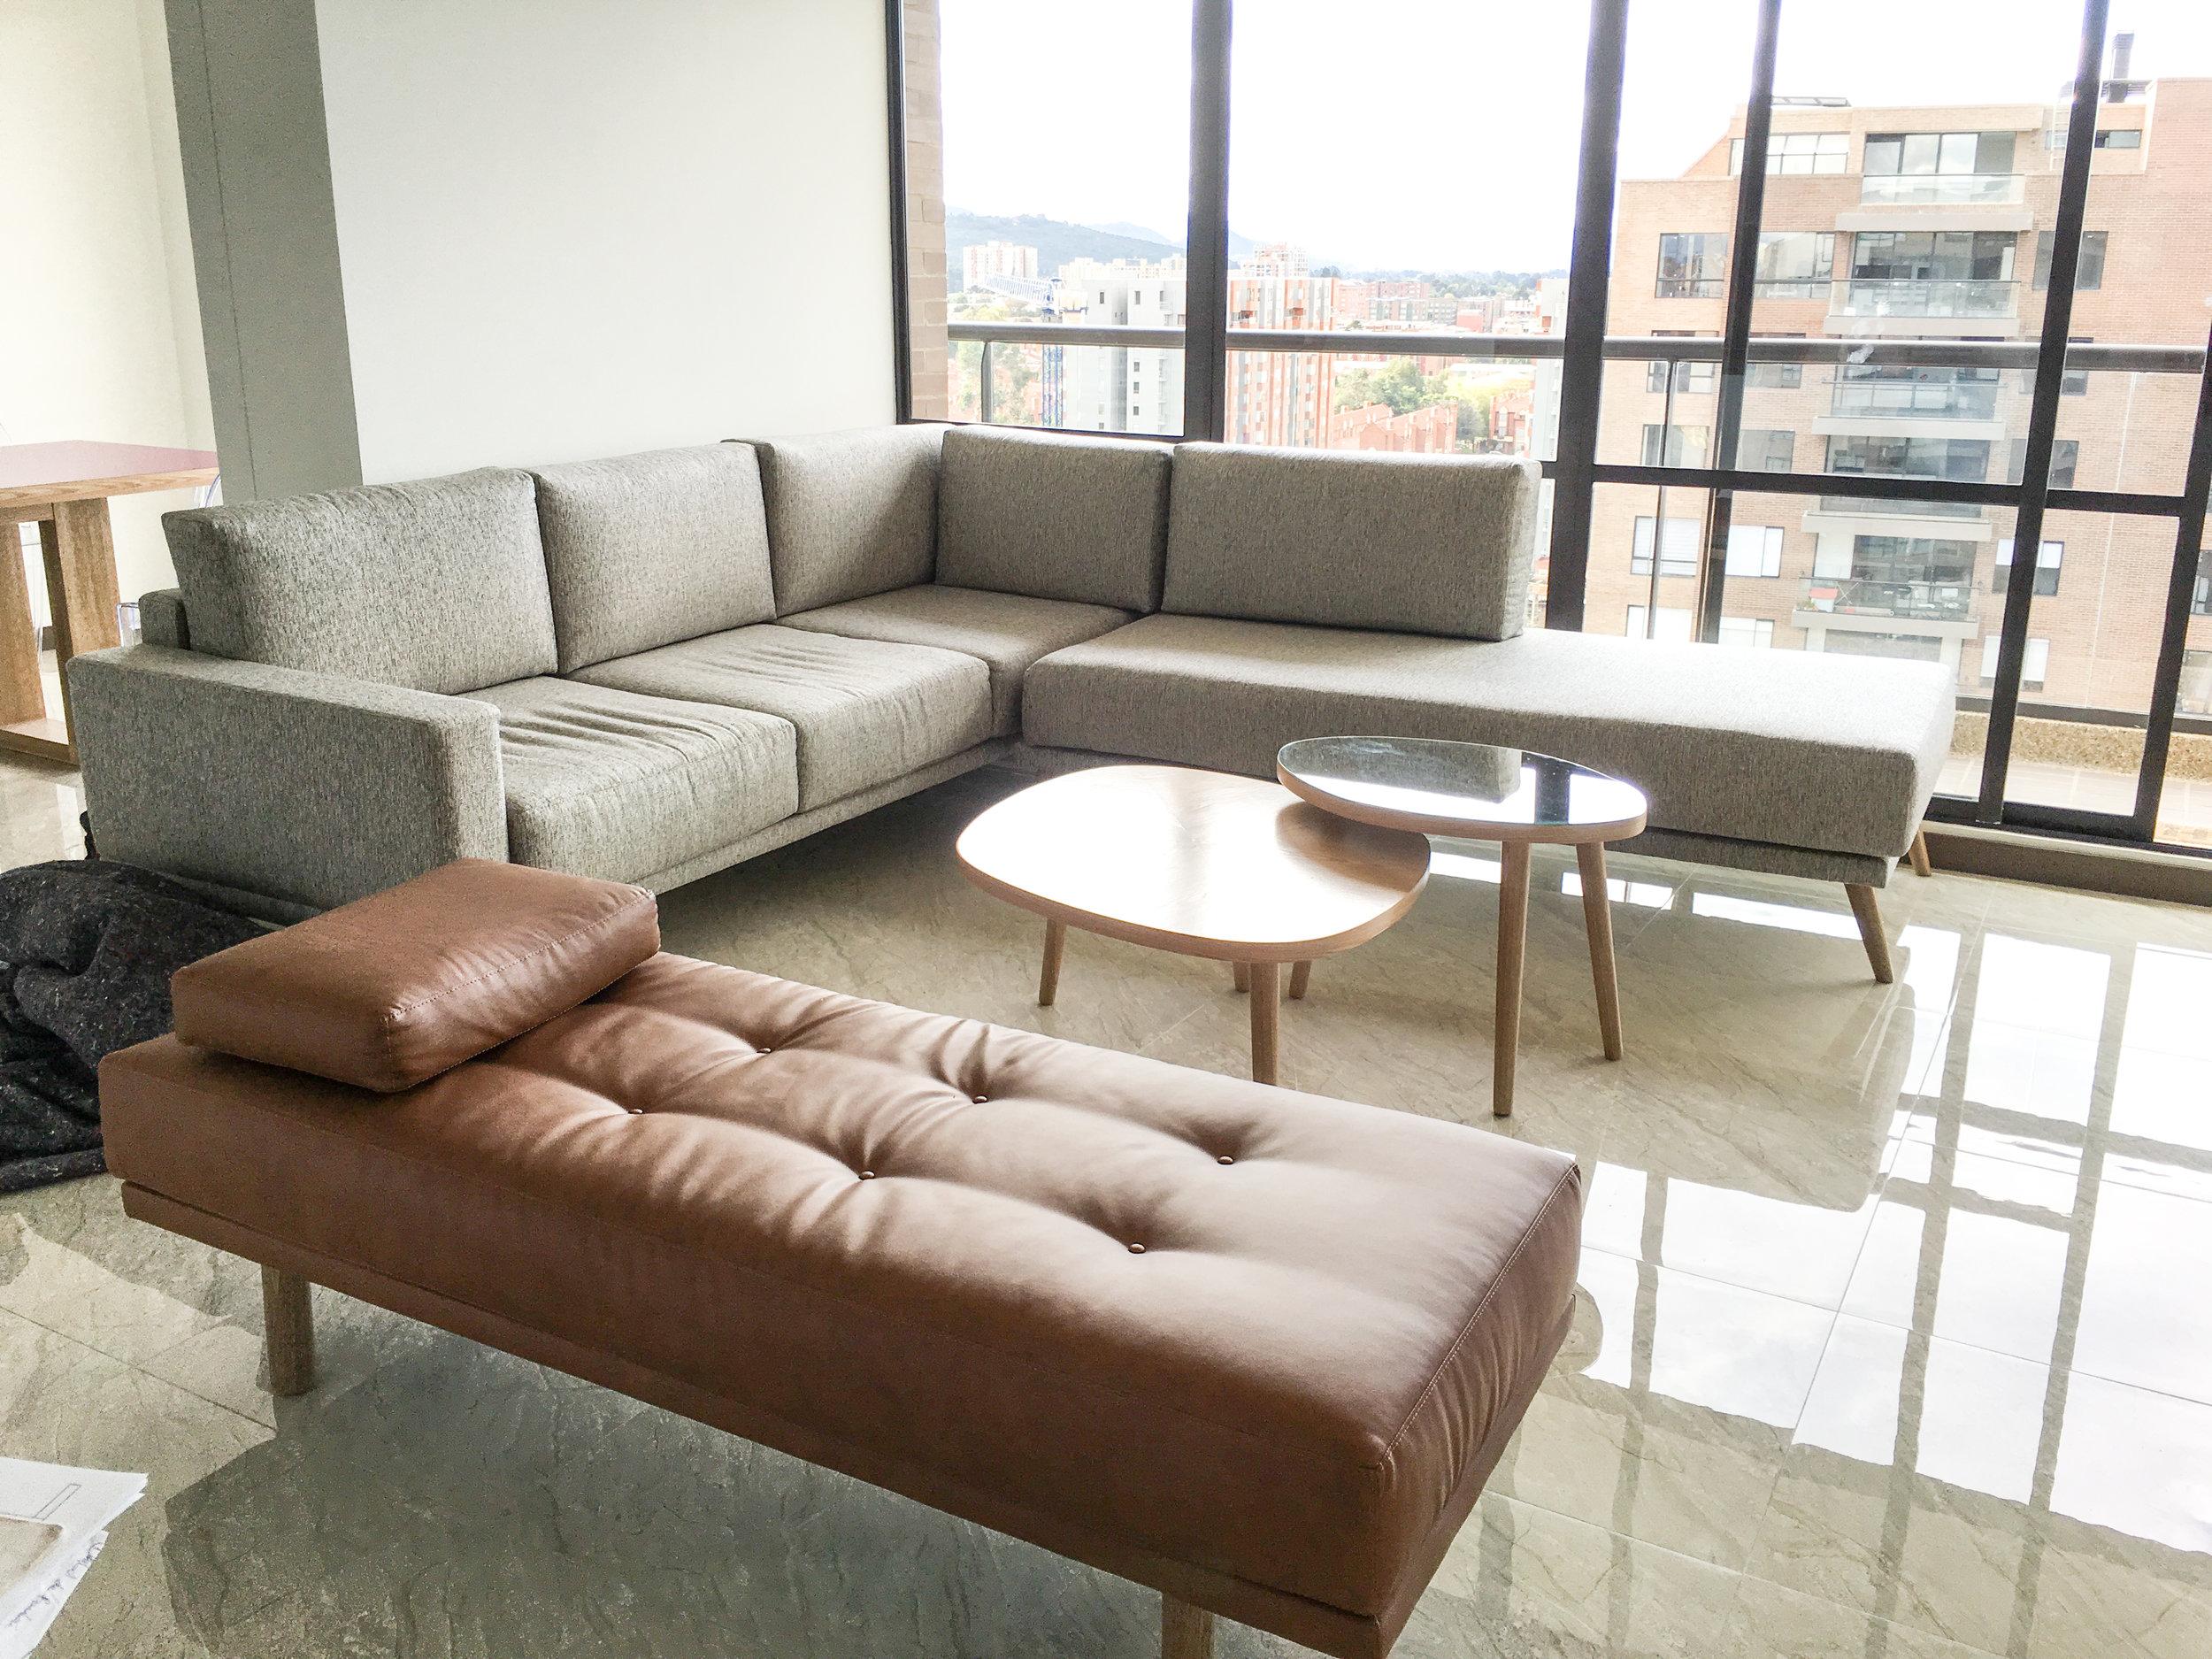 Living Room With Modular Sofa and Caramel Bench